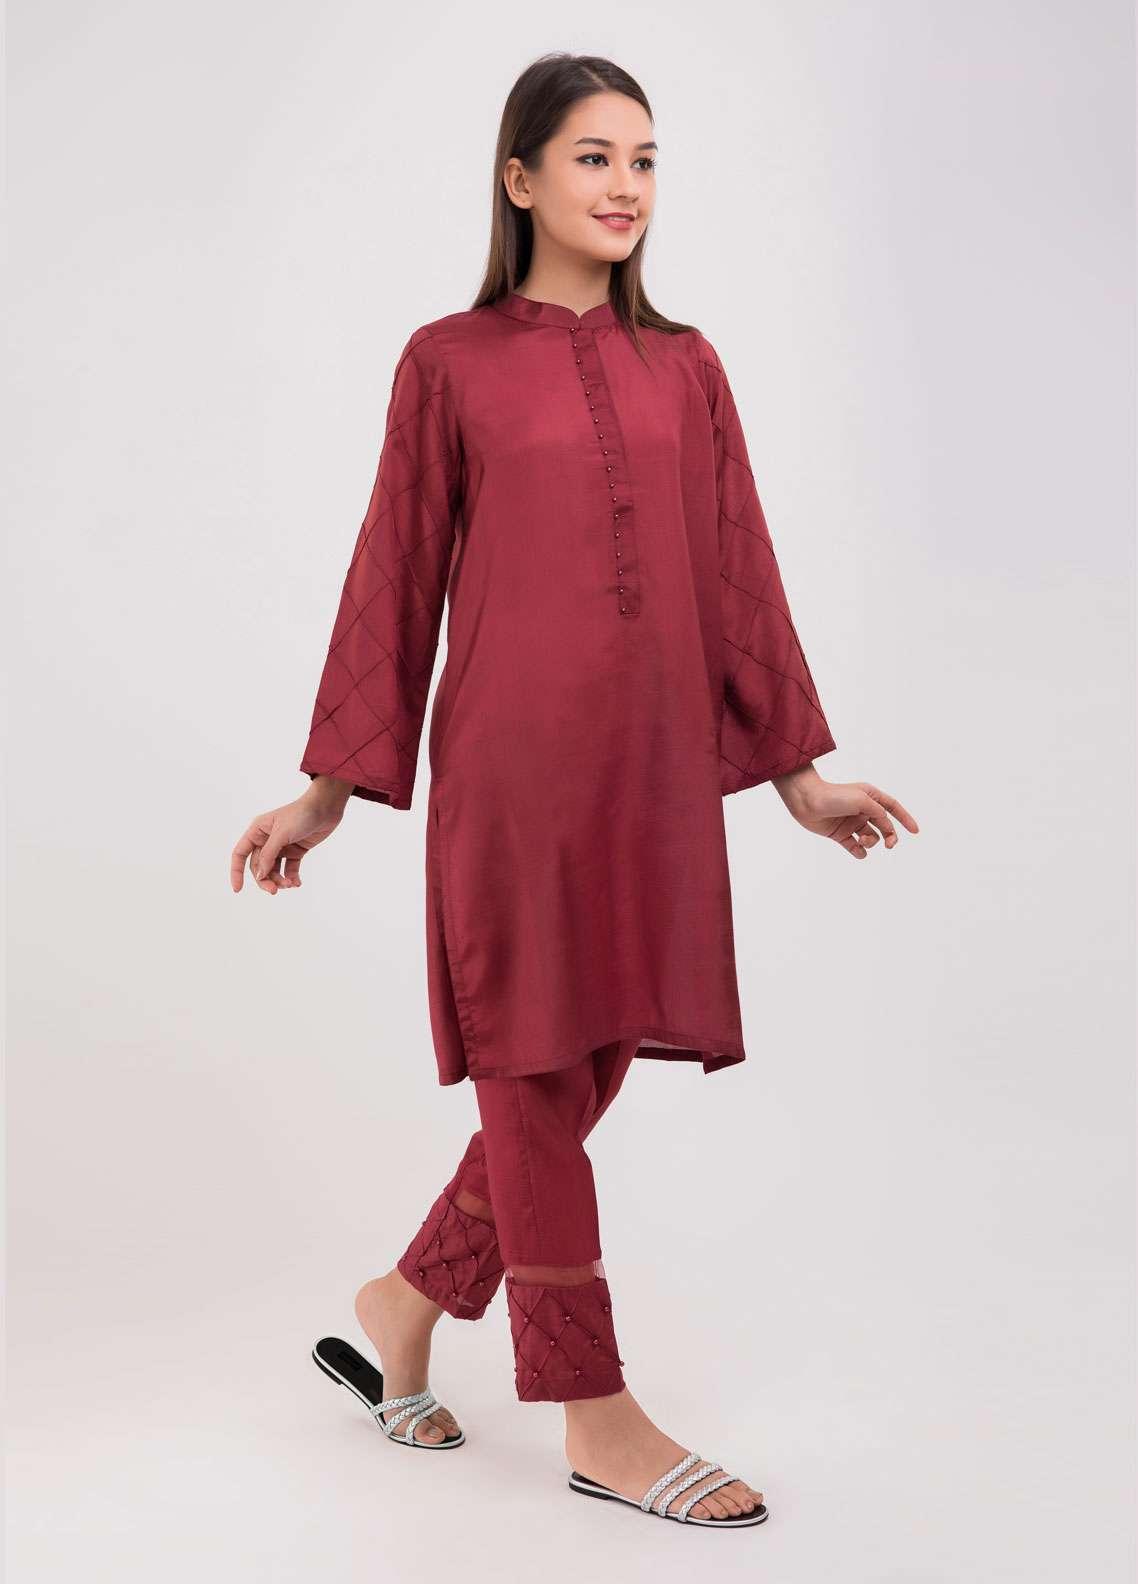 Dhanak Embroidered Raw Silk Stitched 2 Piece Suit Maroon DA-1035